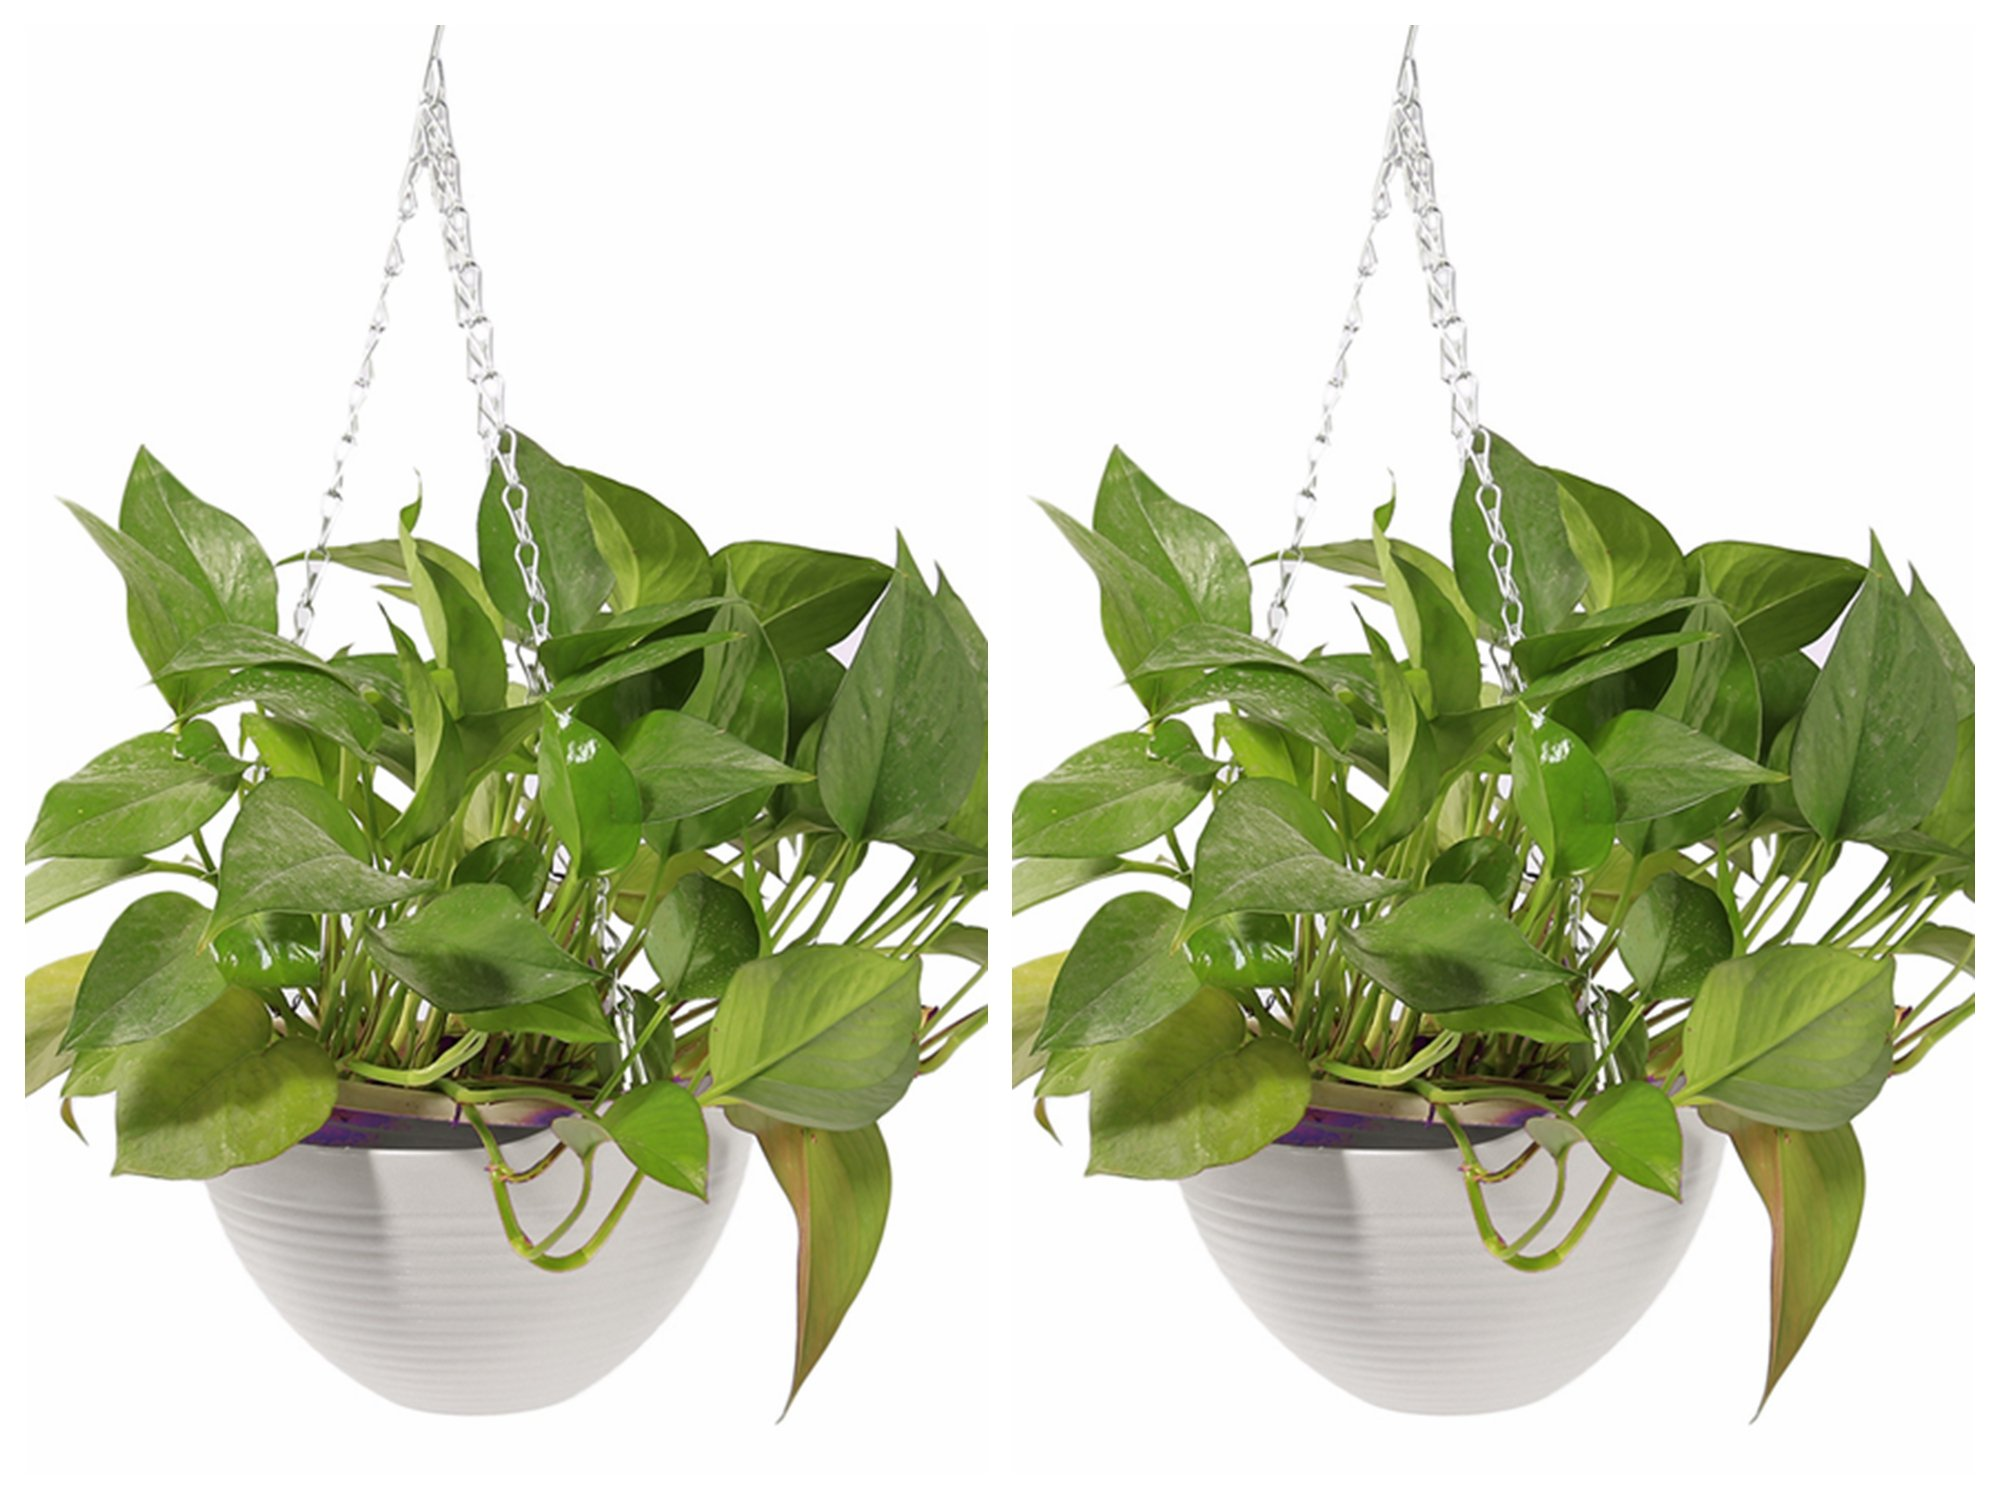 Garden Pots 2pcs, Petforu Hanging Flower Basket EMPTY Flowerpot Plant Hooks Hangers - WHITE by Petforu